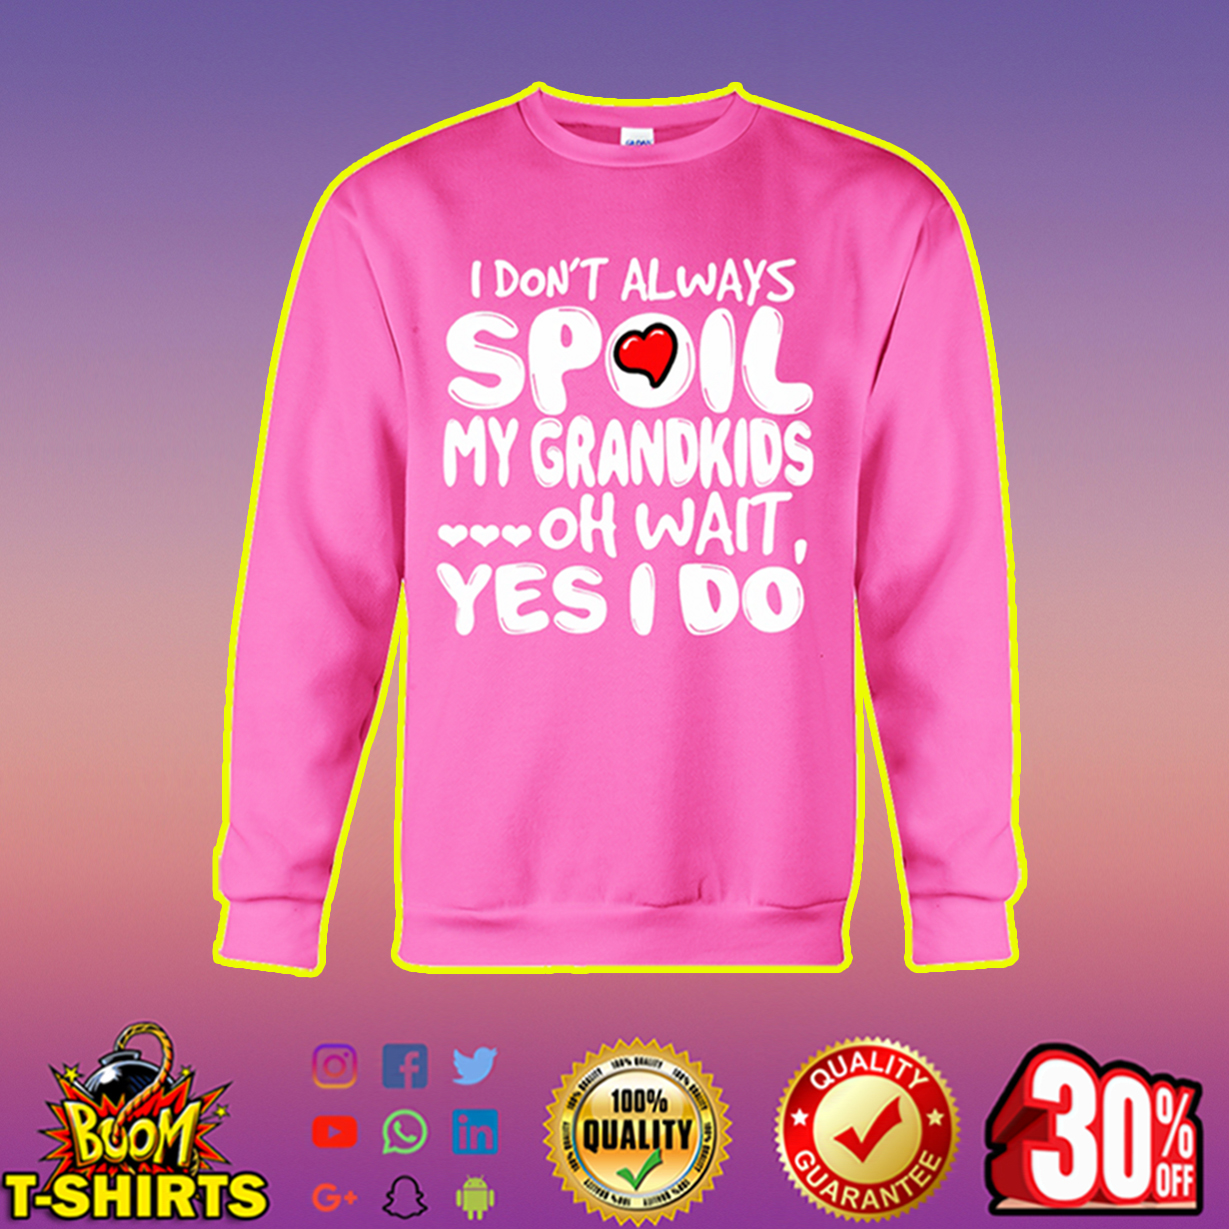 I don't always spoil my grandkids oh wait yes I do sweatshirt